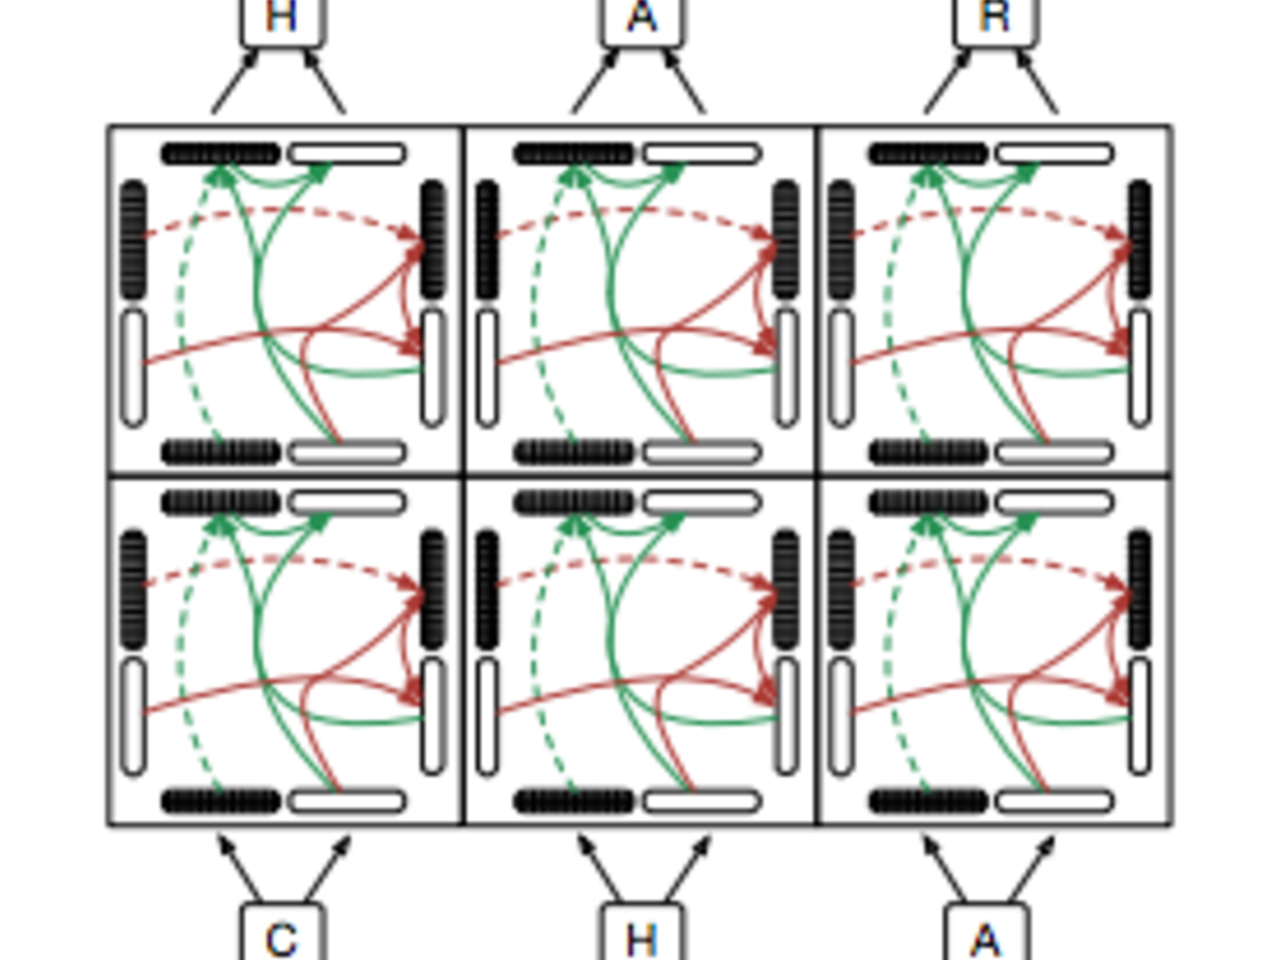 GridRNN in tensorflow